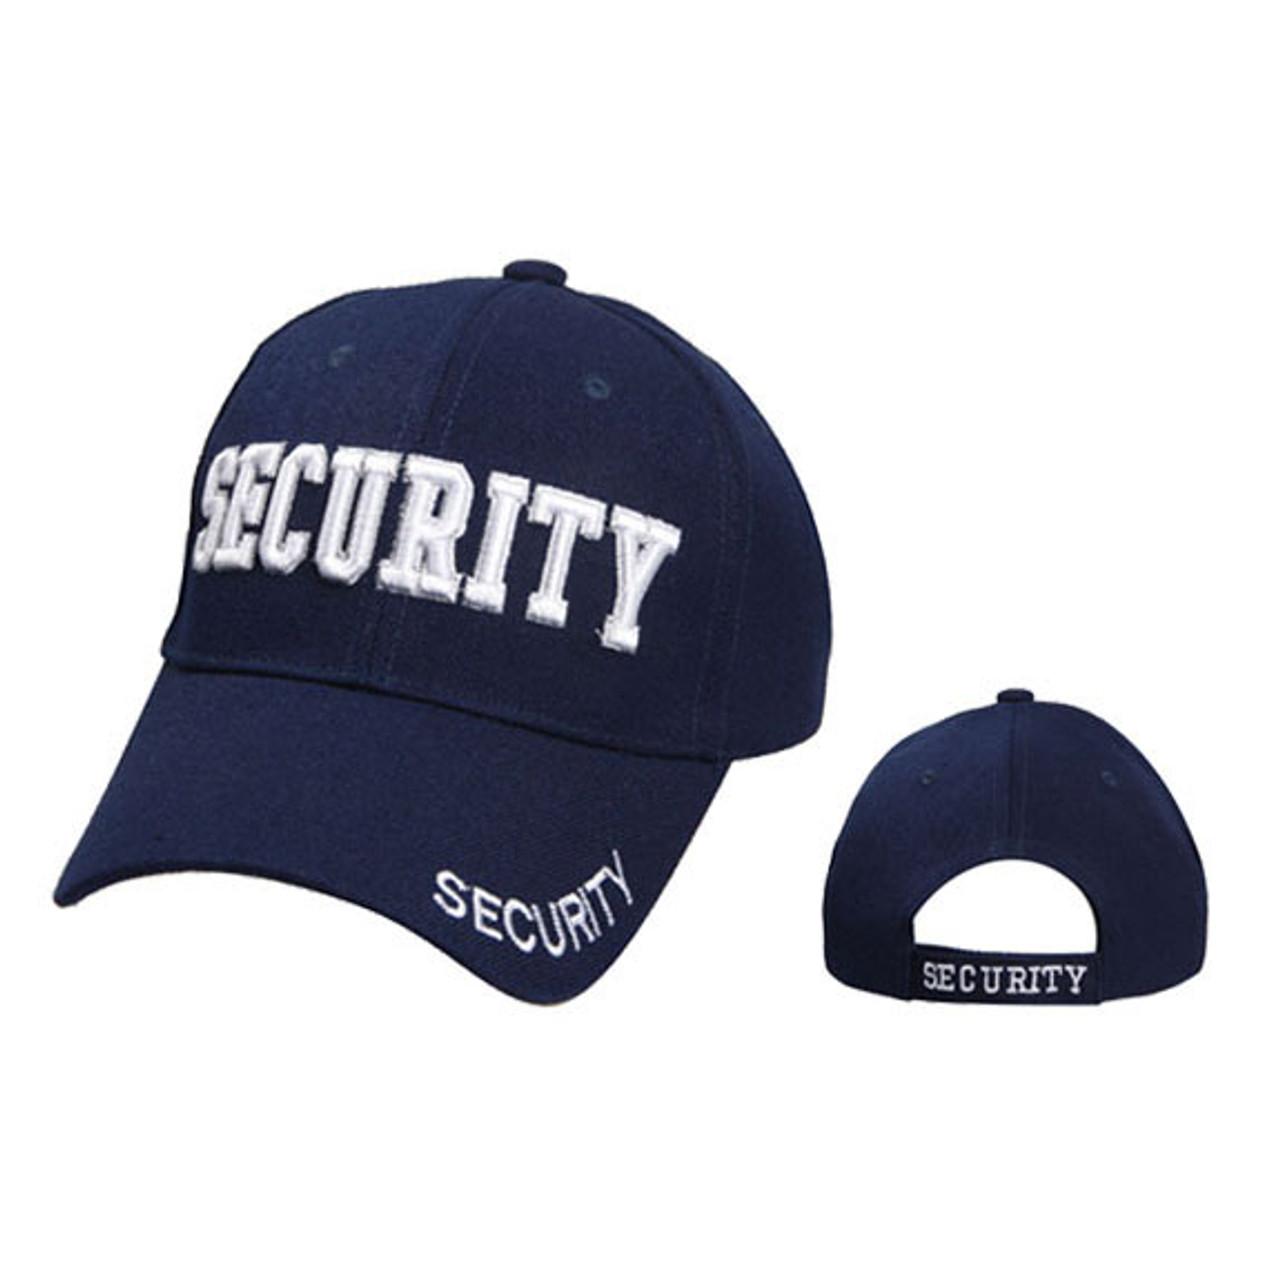 Wholesale Baseball Cap   Security   Navy Blue